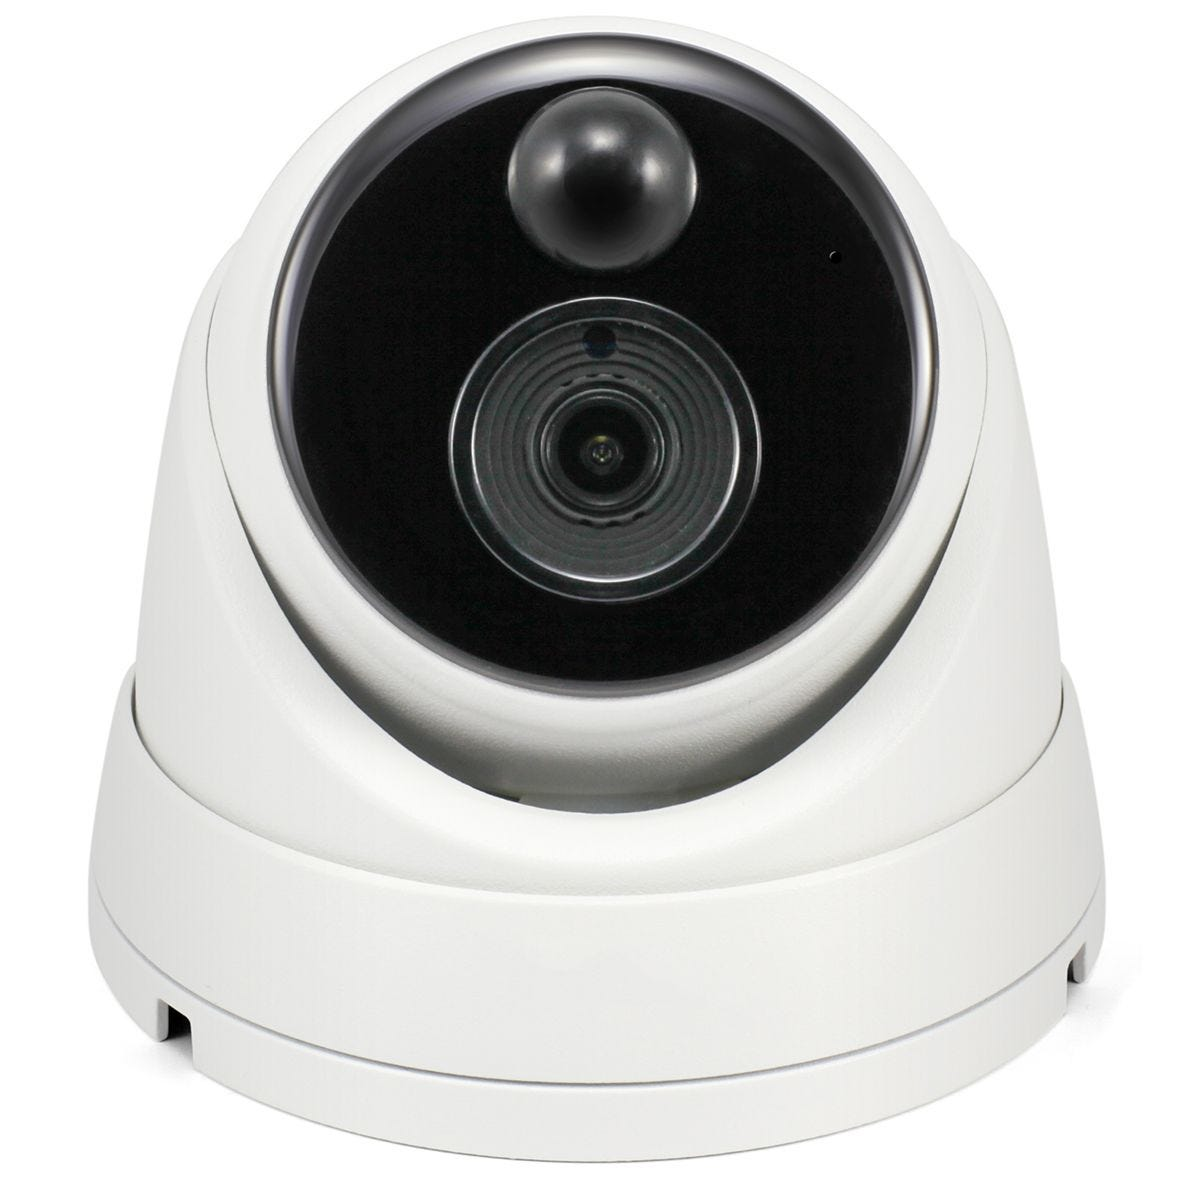 Swann Smart HD Thermal Sensing Dome CCTV Security Camera